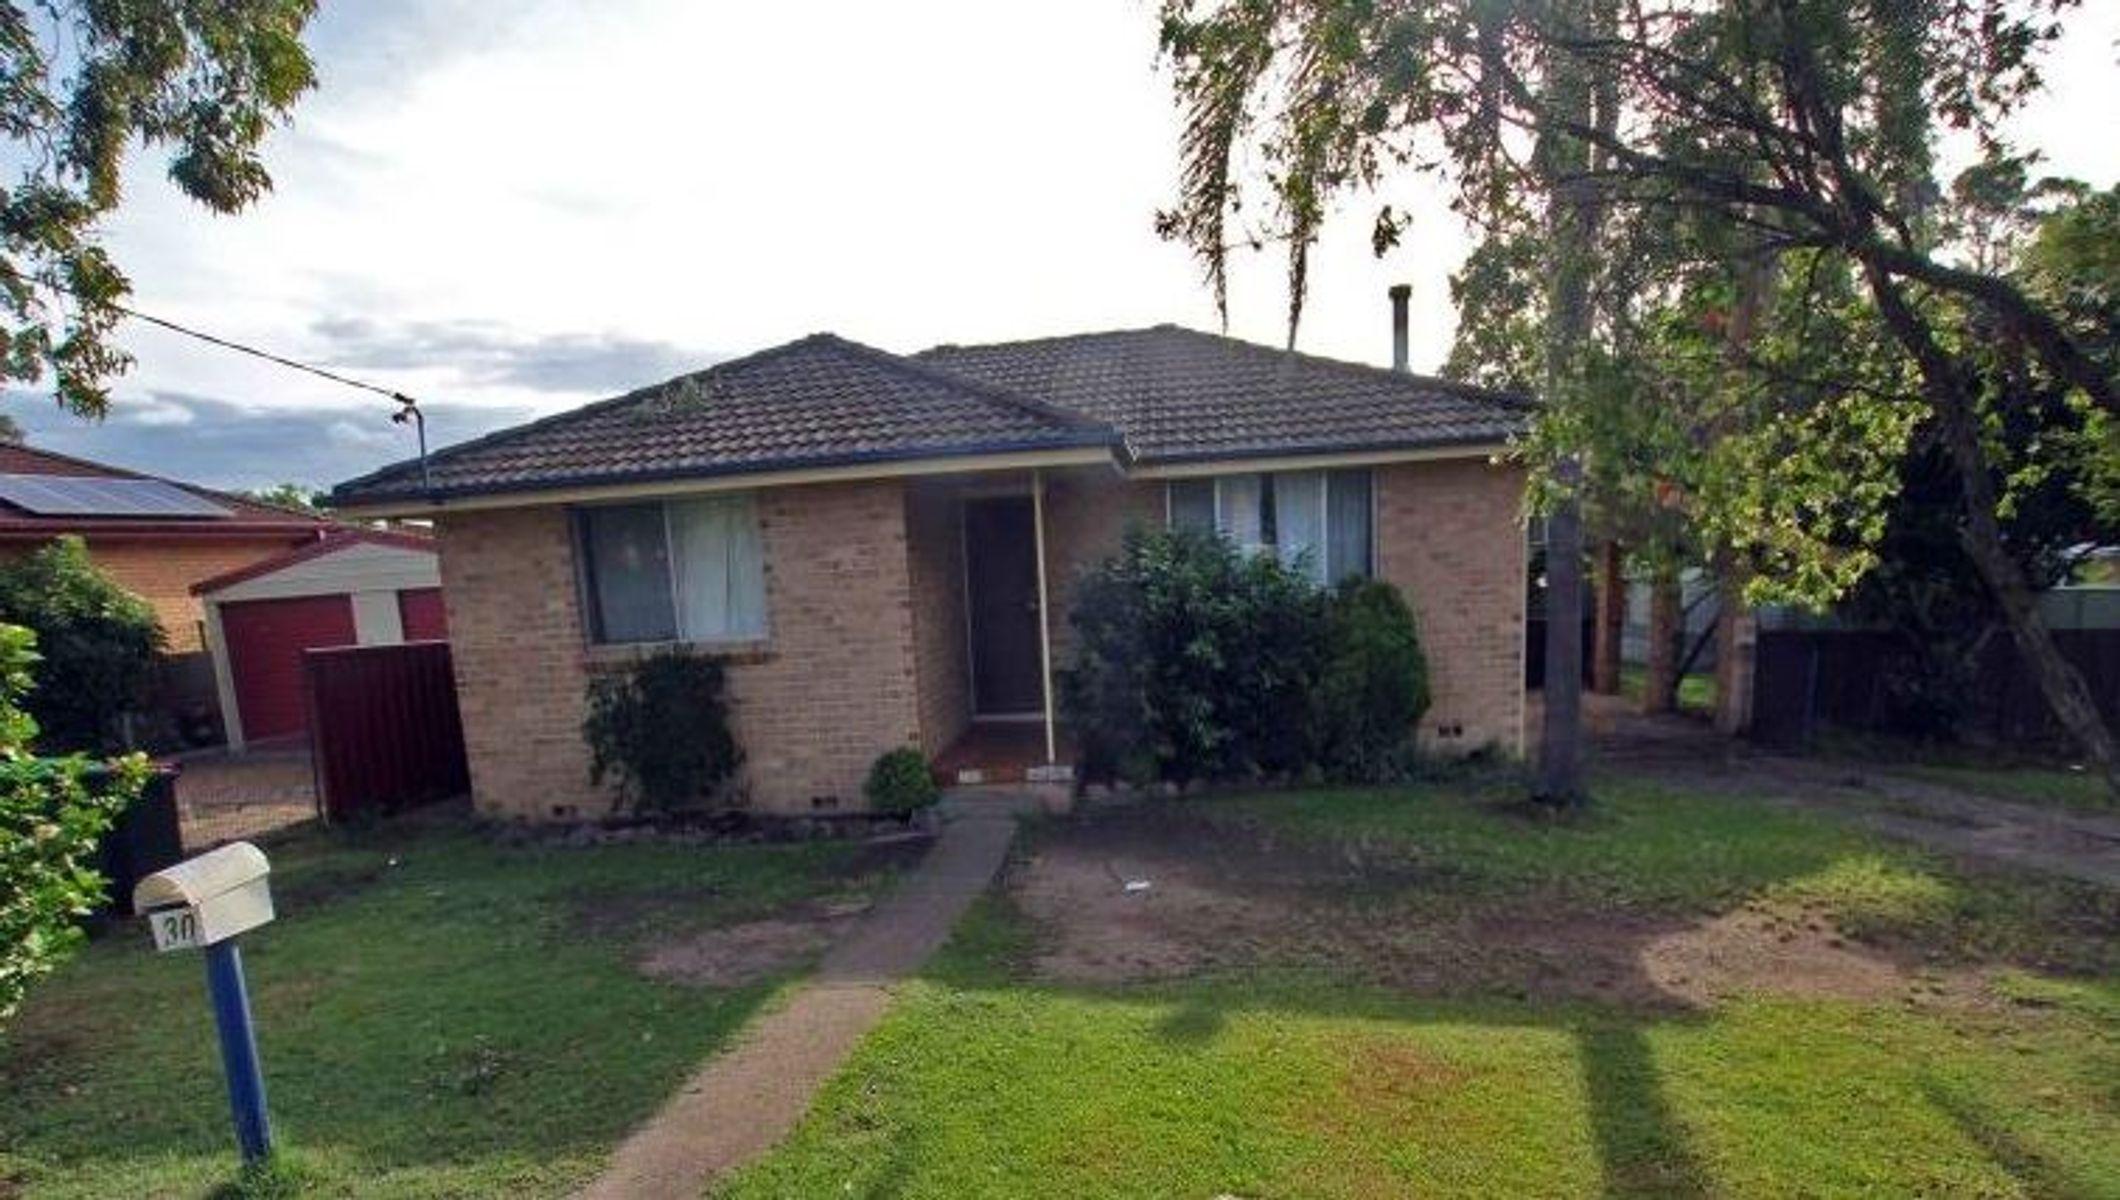 30  Mudford Street, Taree, NSW 2430